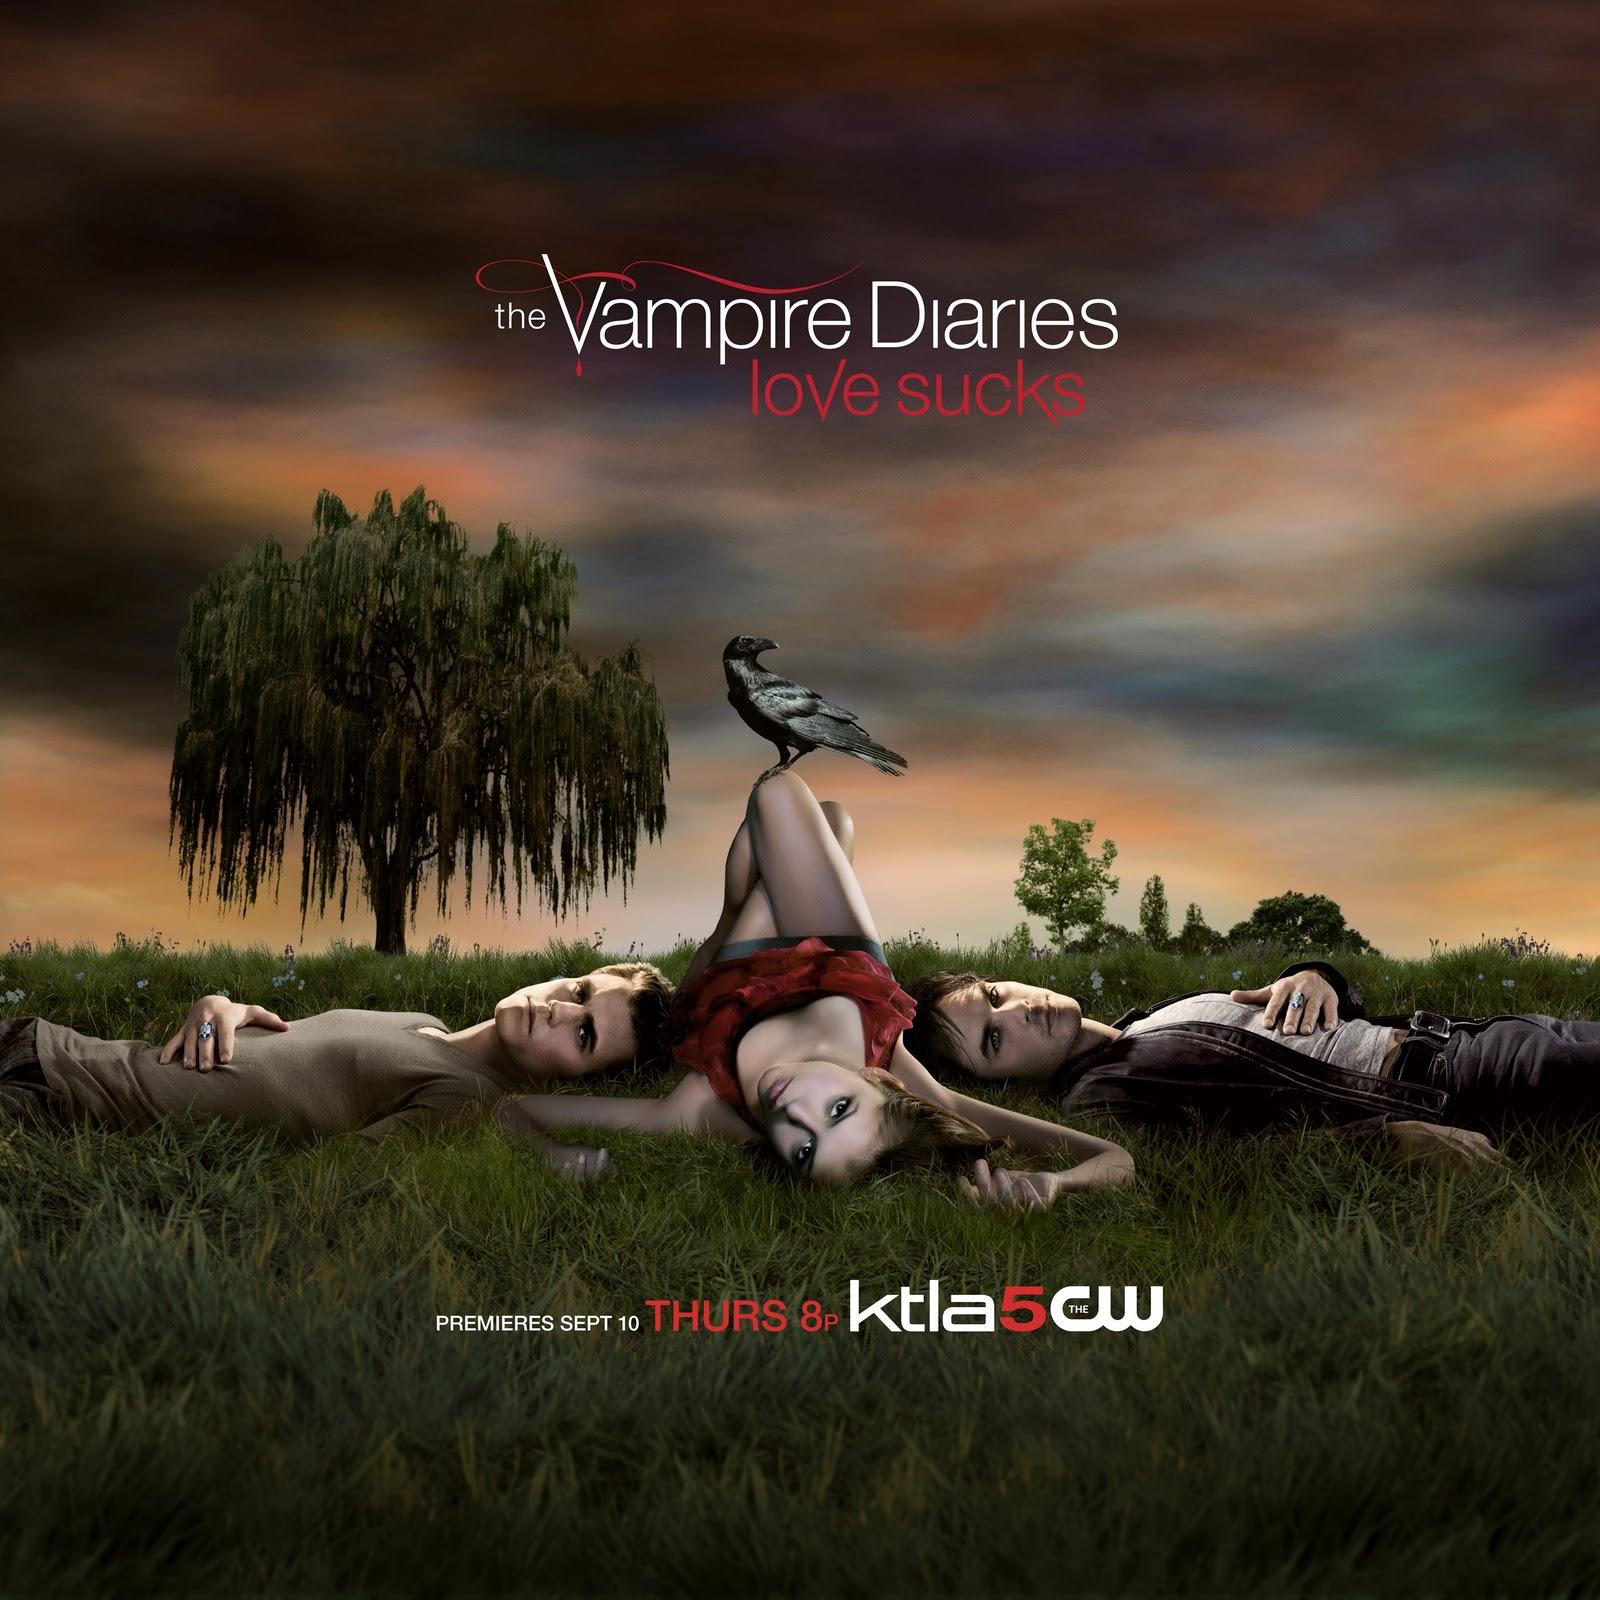 Vampire diaries seasons (dvd) – pristine sales.